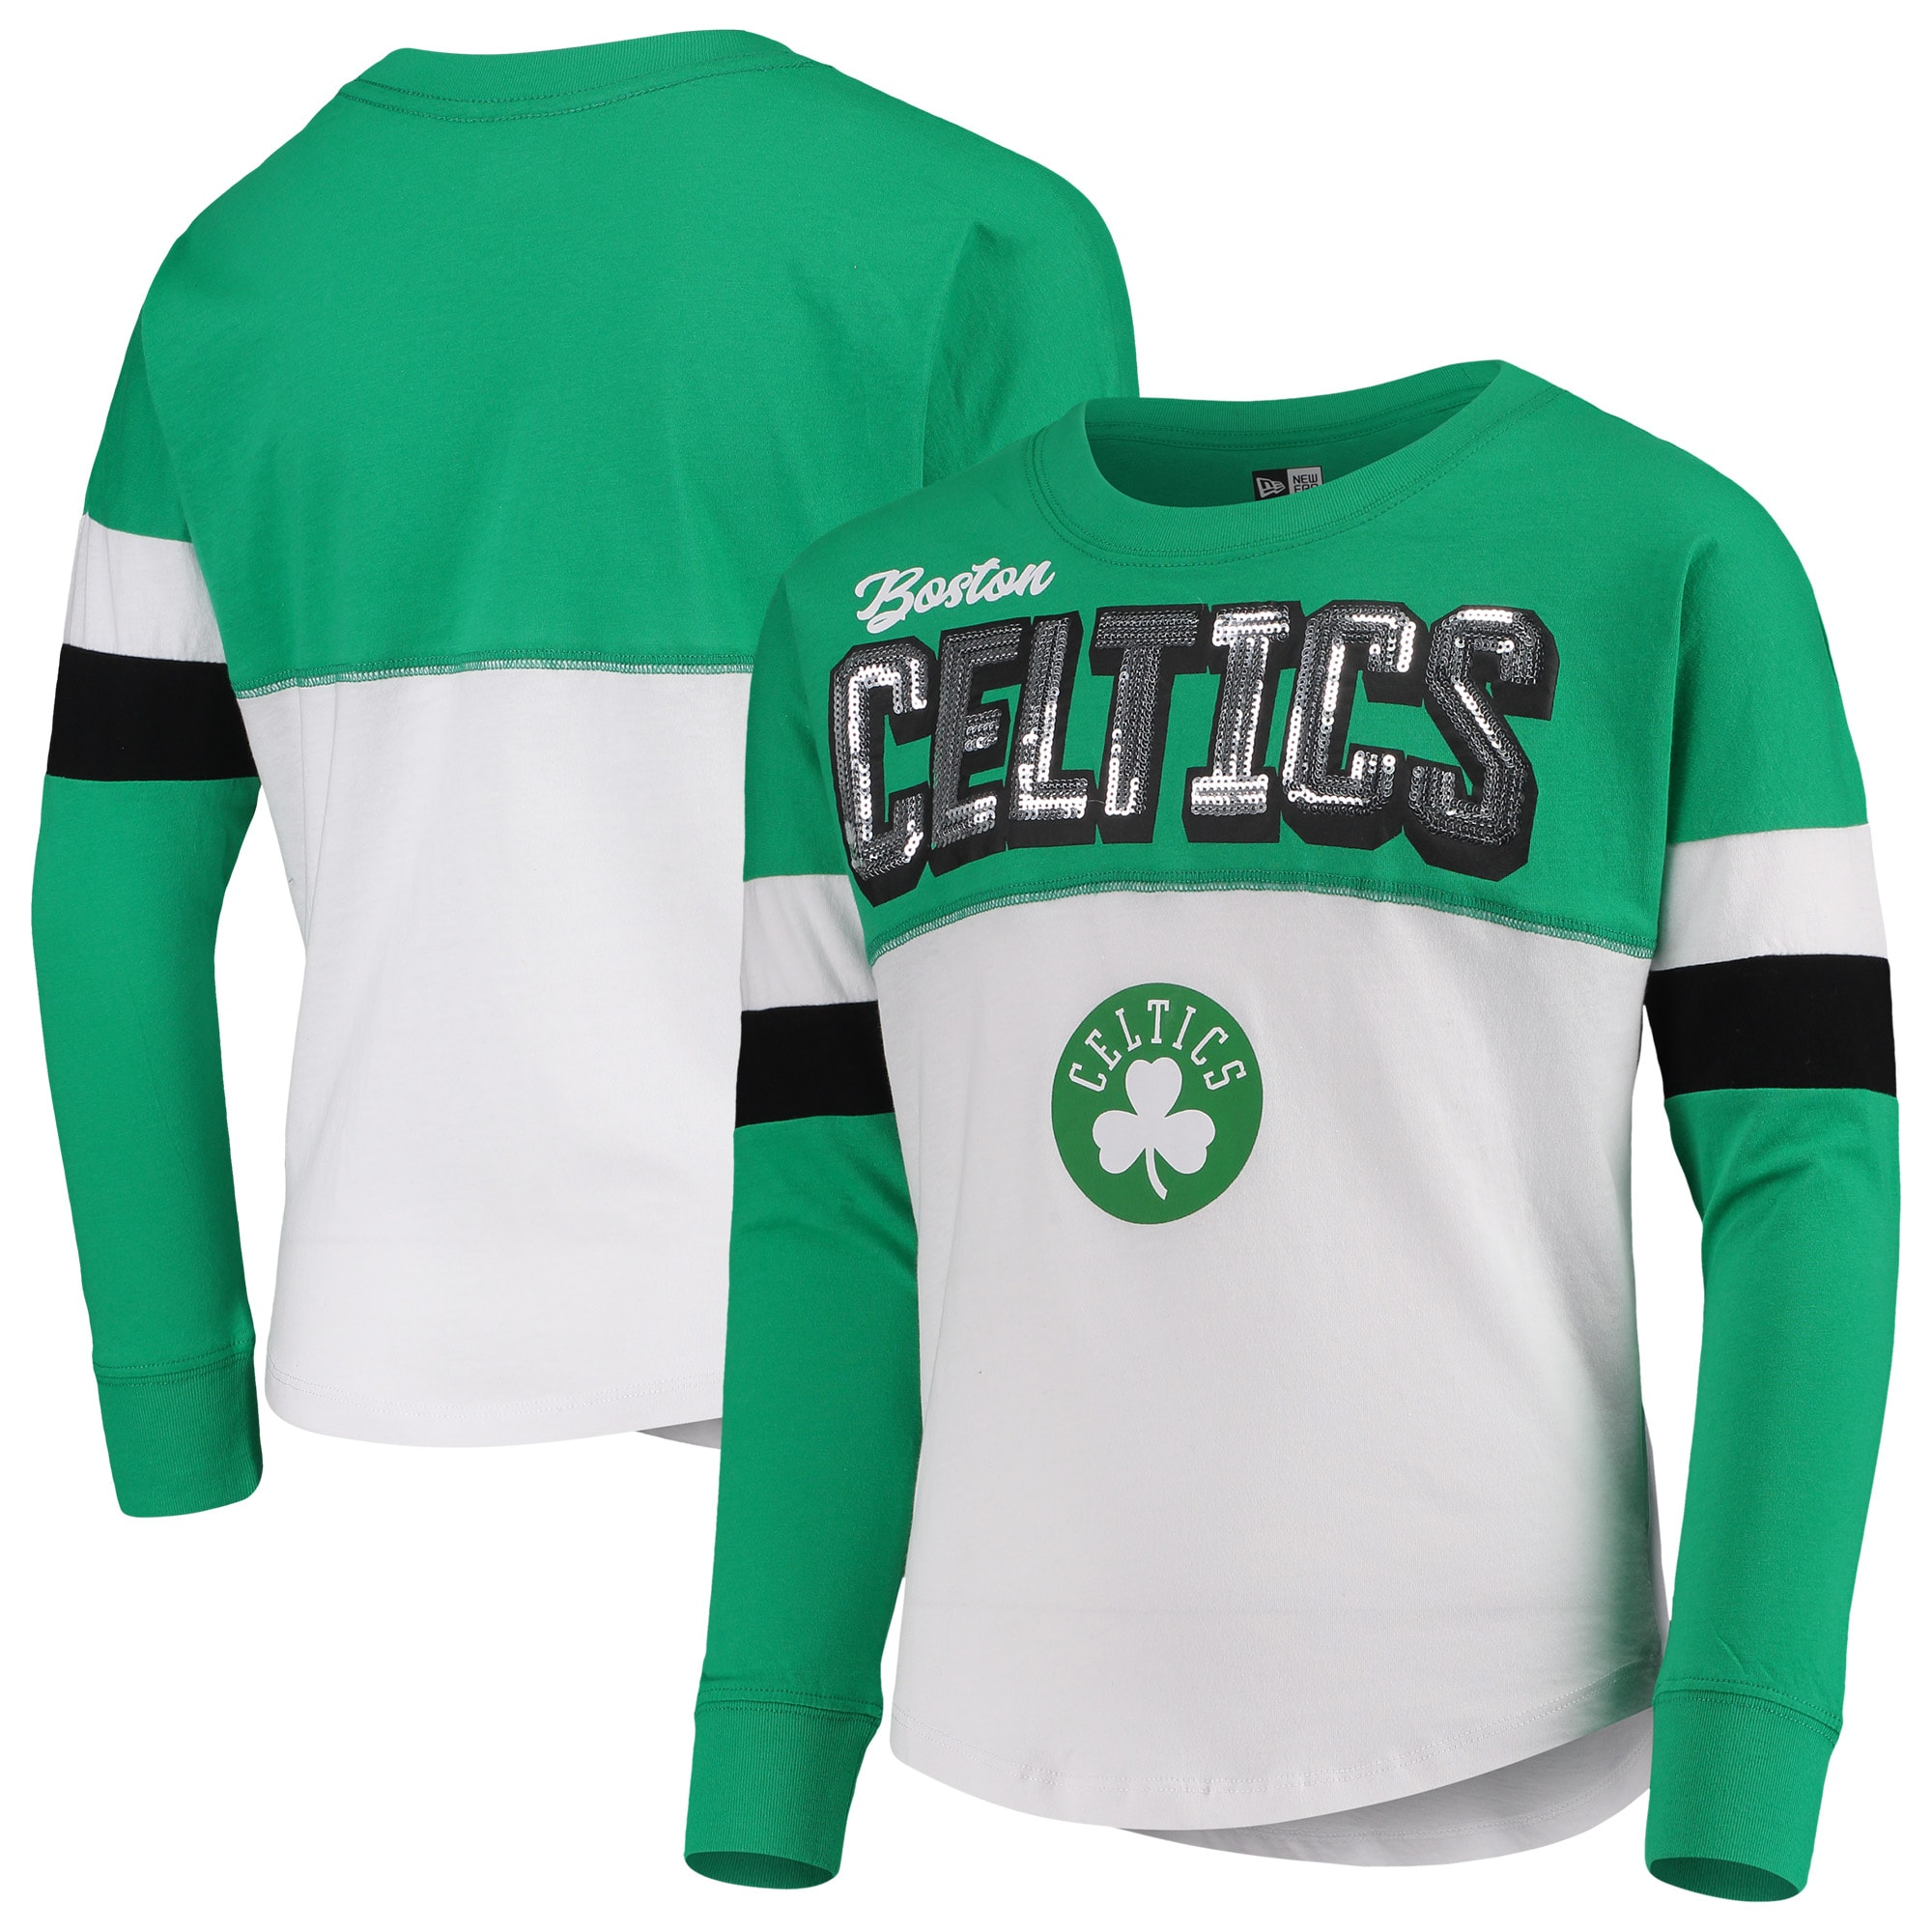 Boston Celtics New Era Girls Youth Long Sleeve Contrast Crew Neck T-Shirt - White